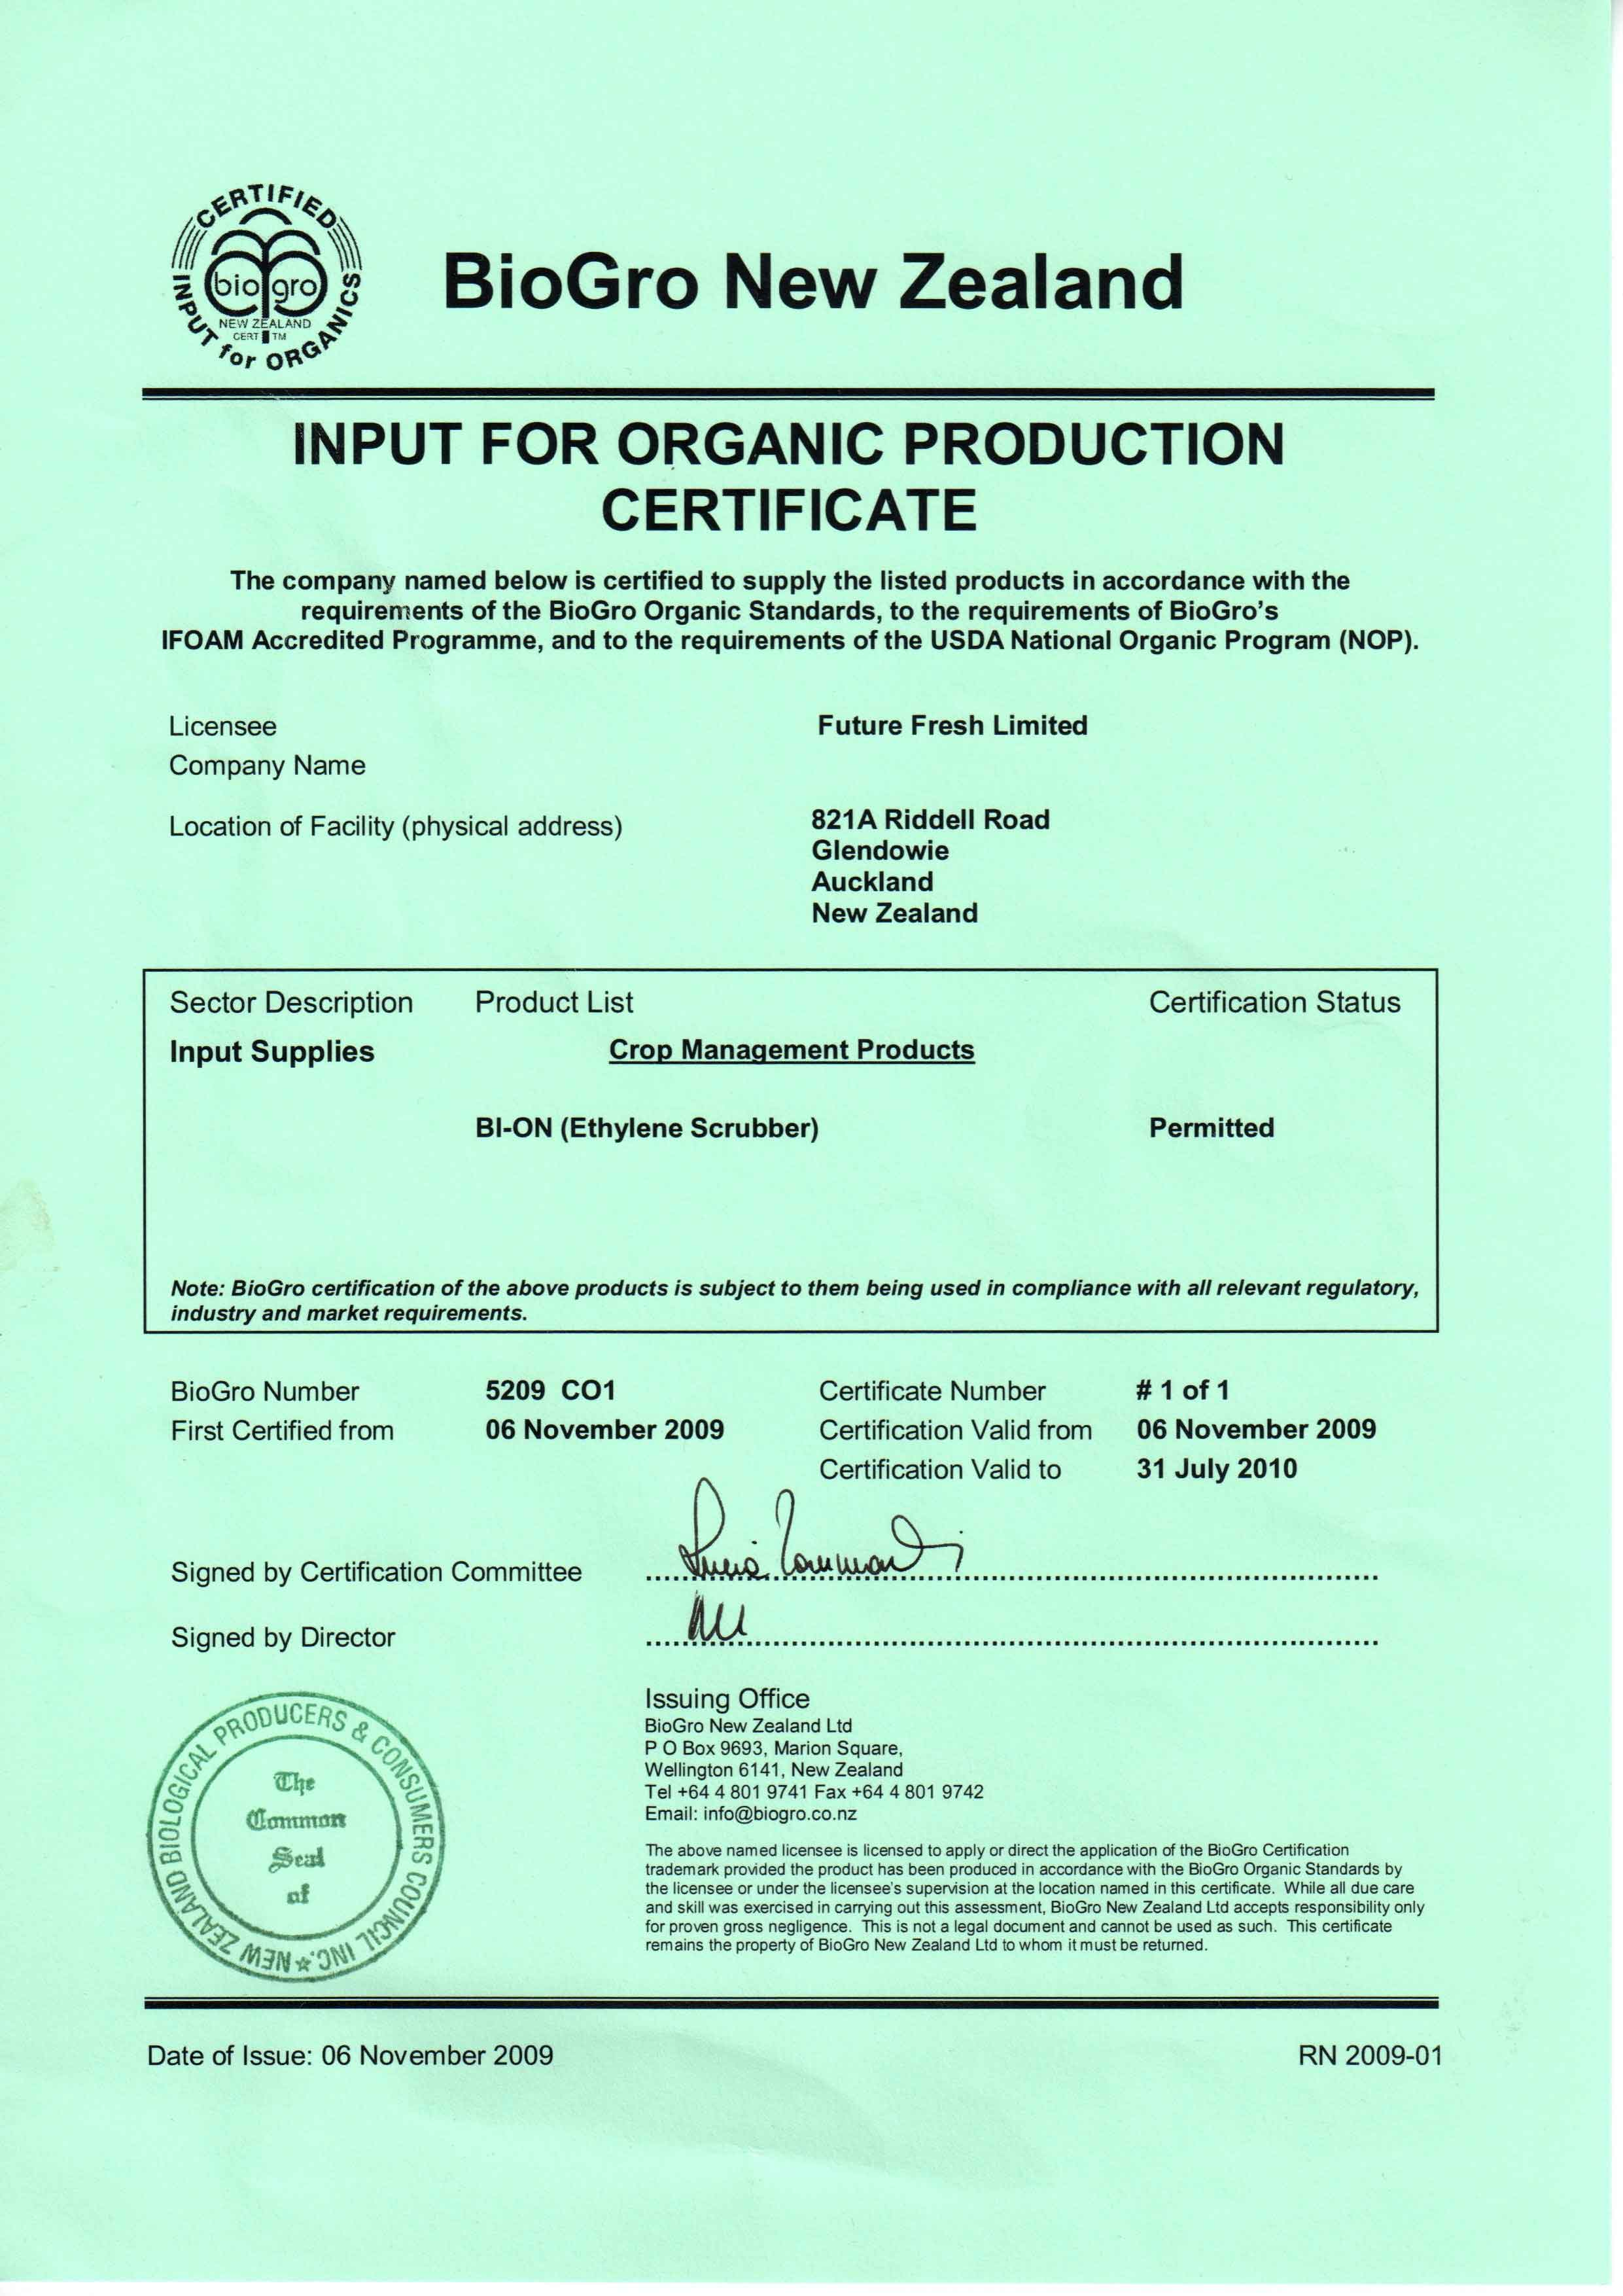 certificado-australia-nueva-zelanda.jpg